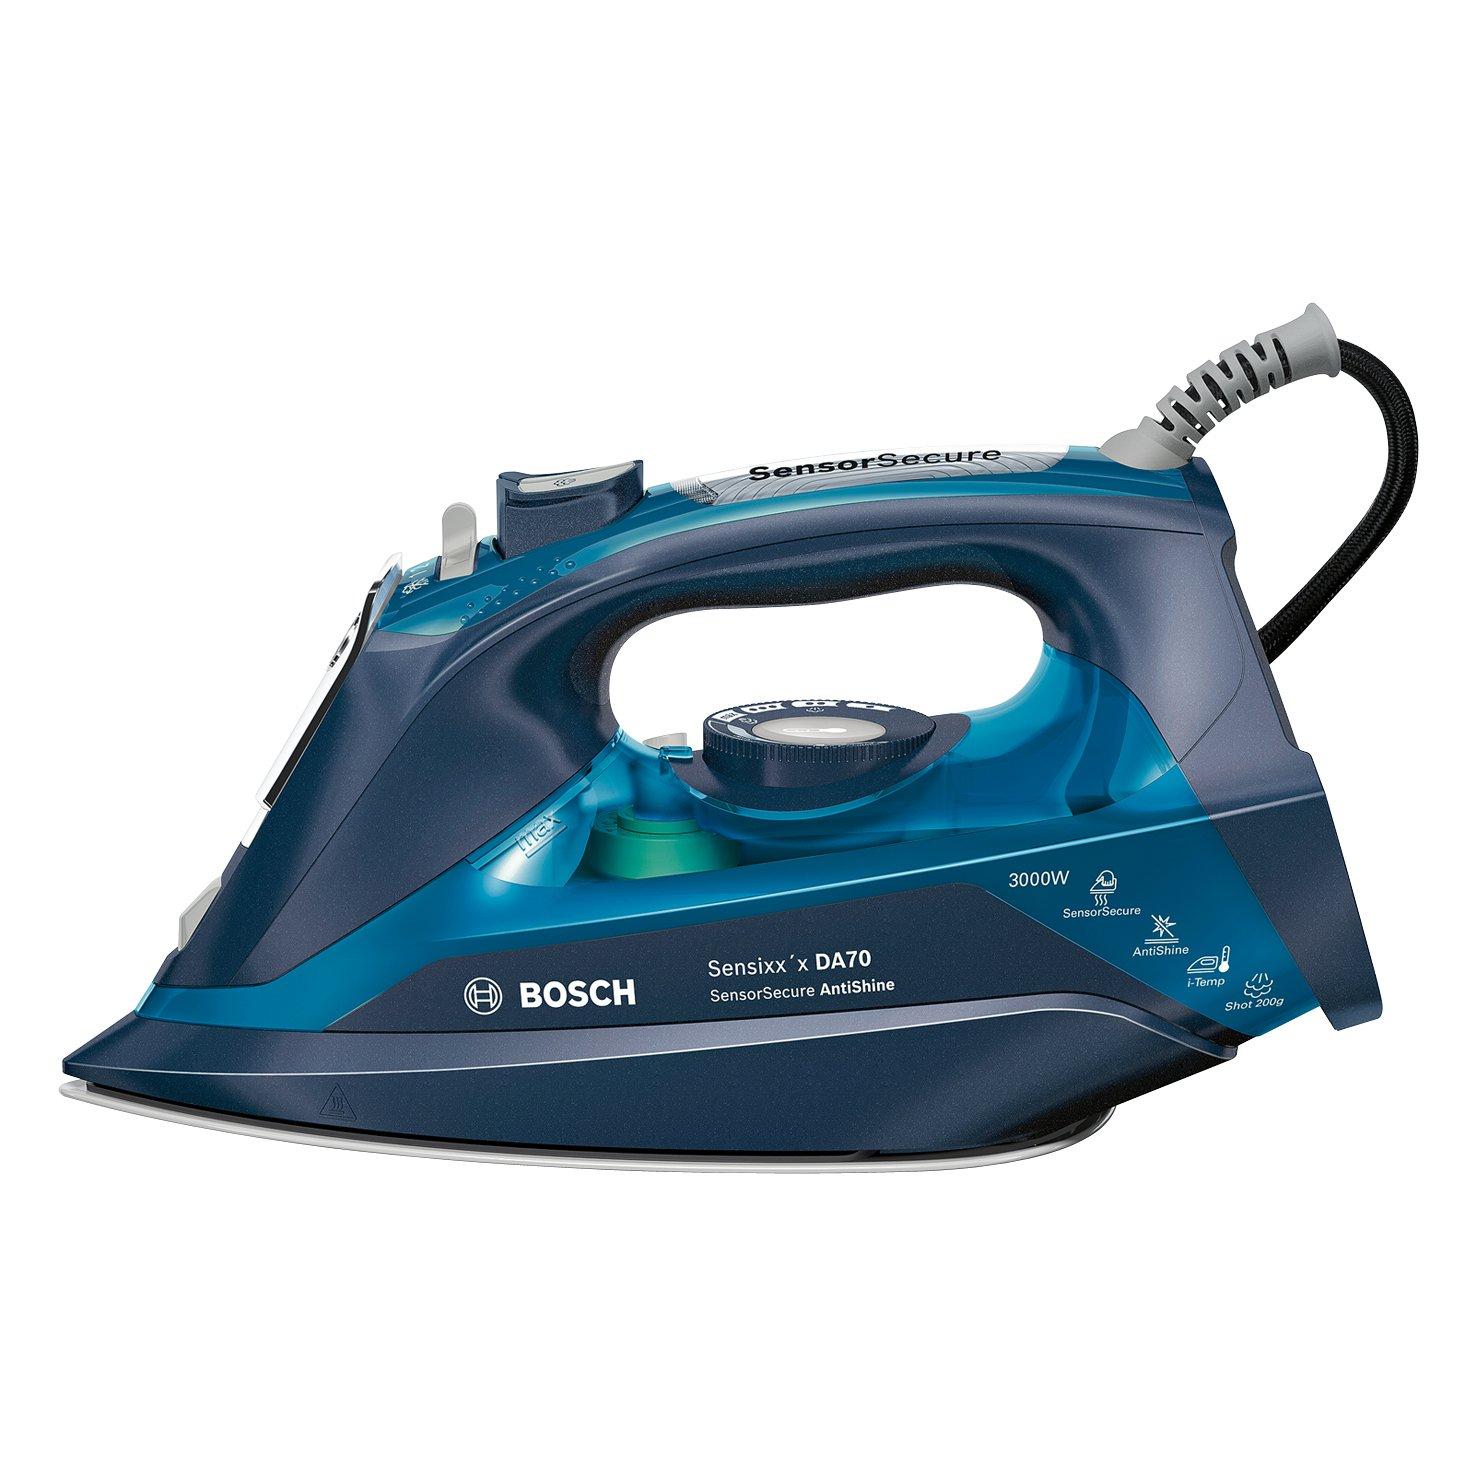 Vapor constante 50 g//min Cer/ámica Plancha de vapor Bosch TDA703021A 3000W Azul